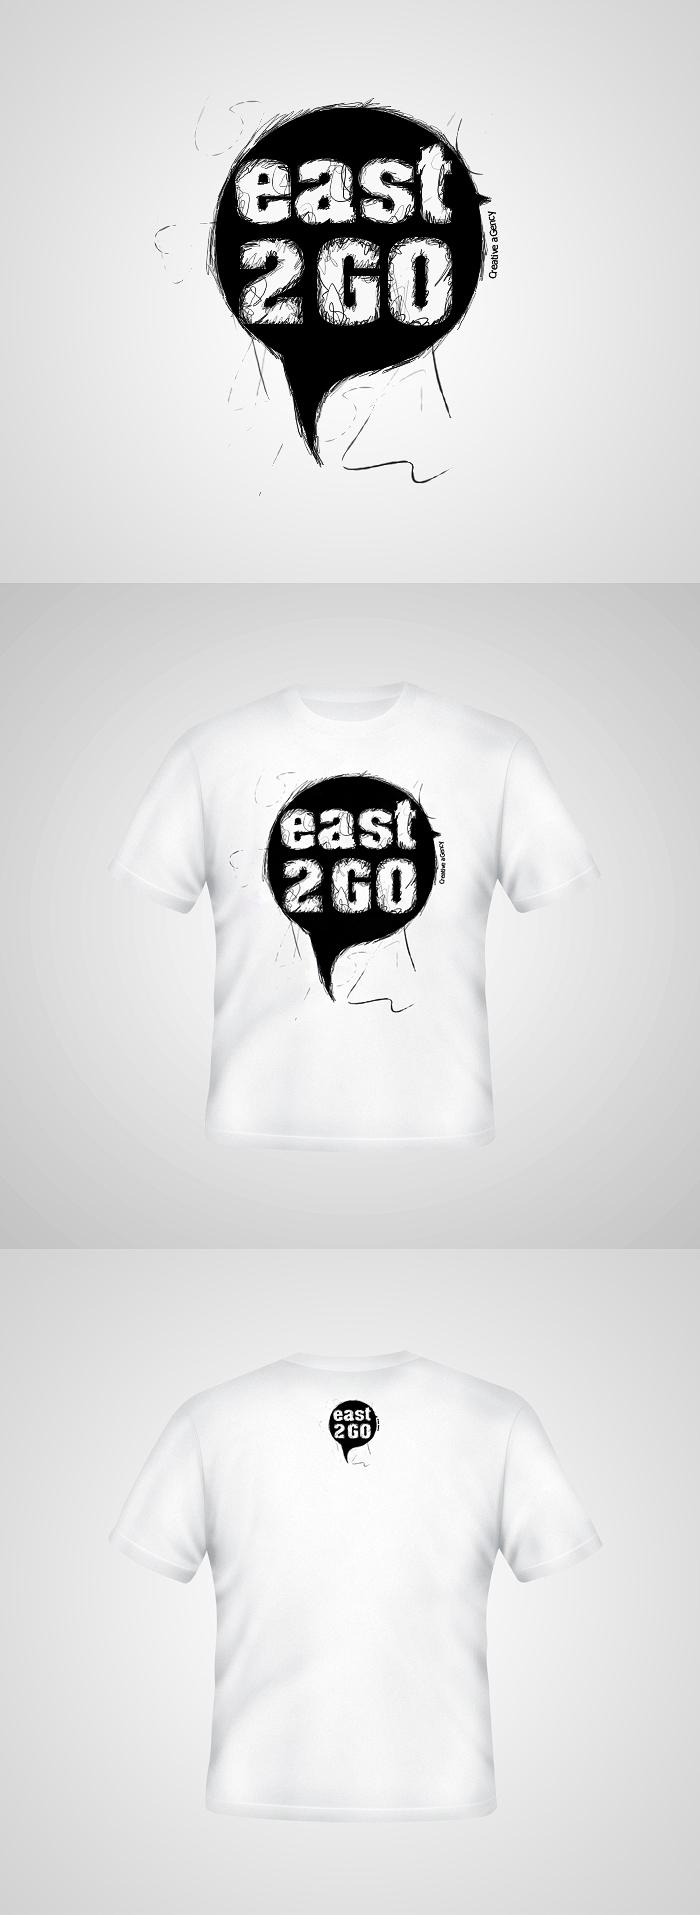 East 2 Go T-shirt design